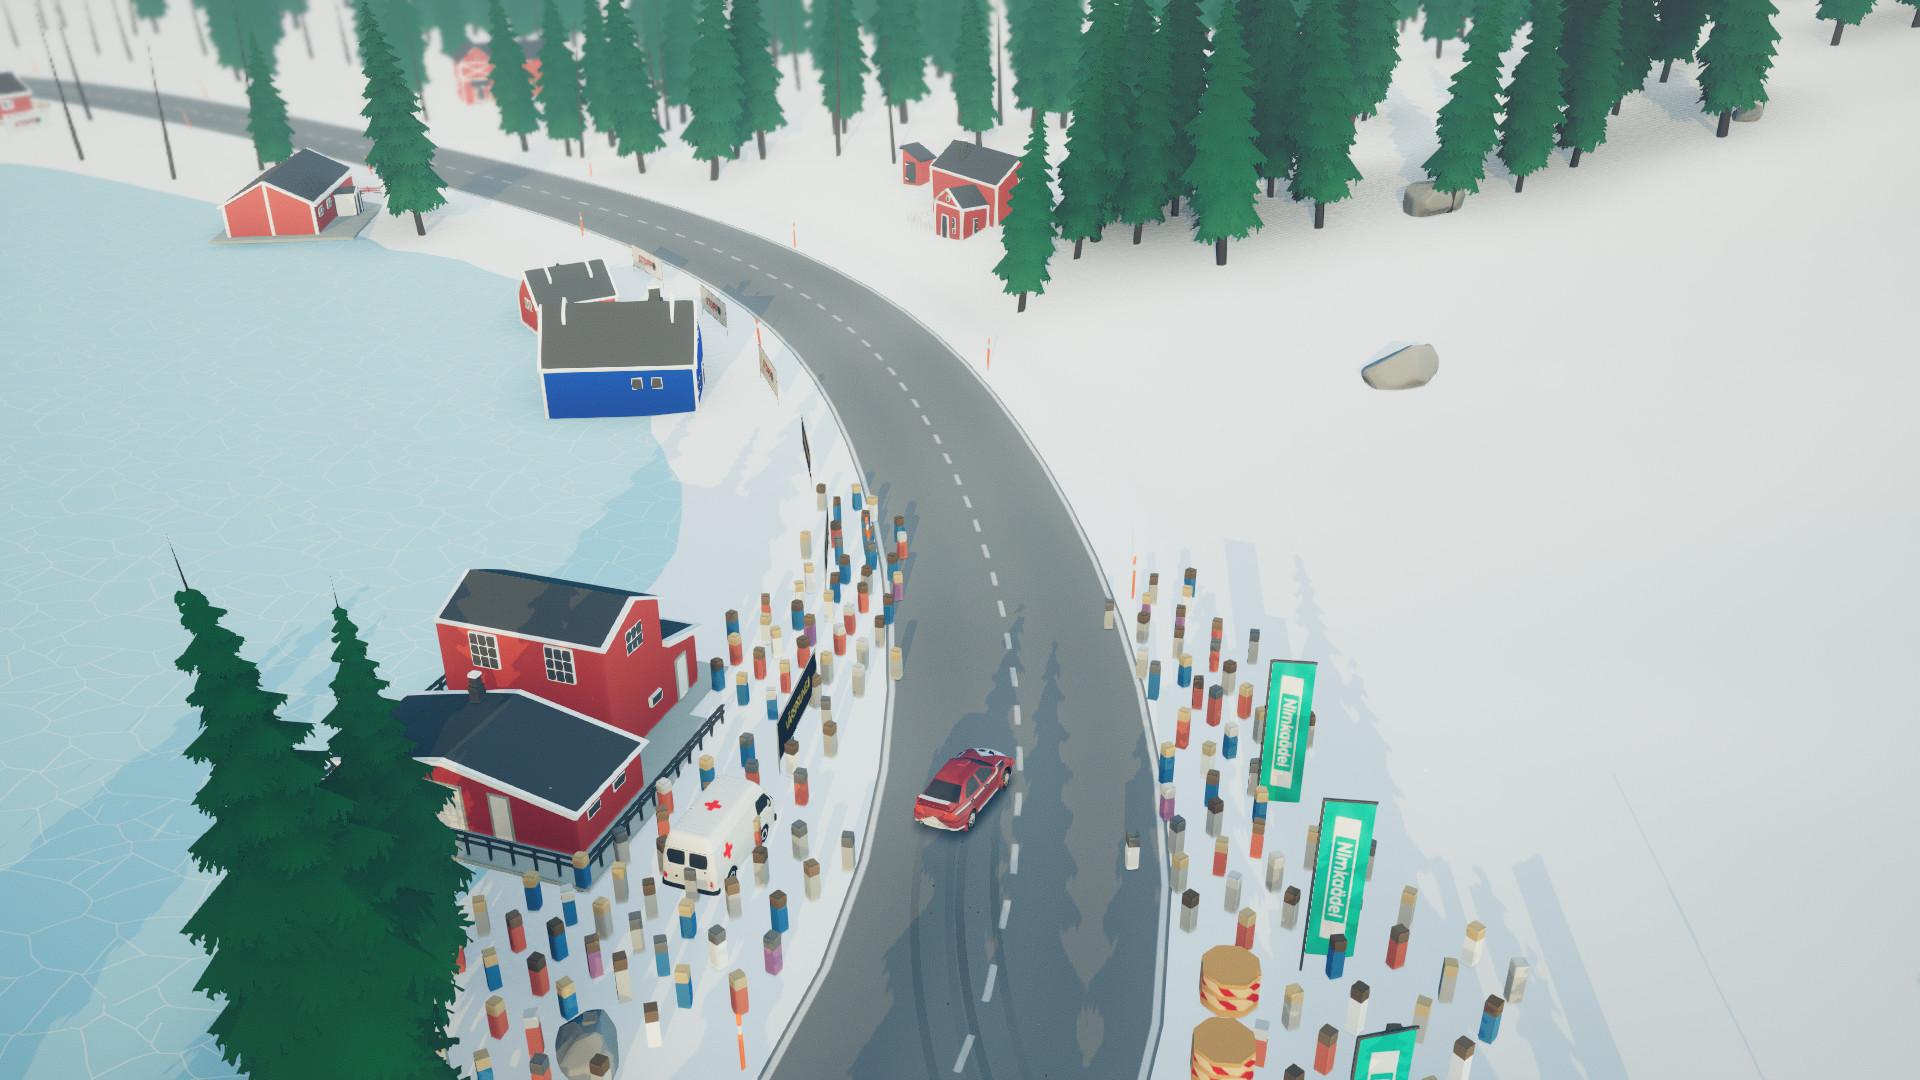 art-of-rally-a